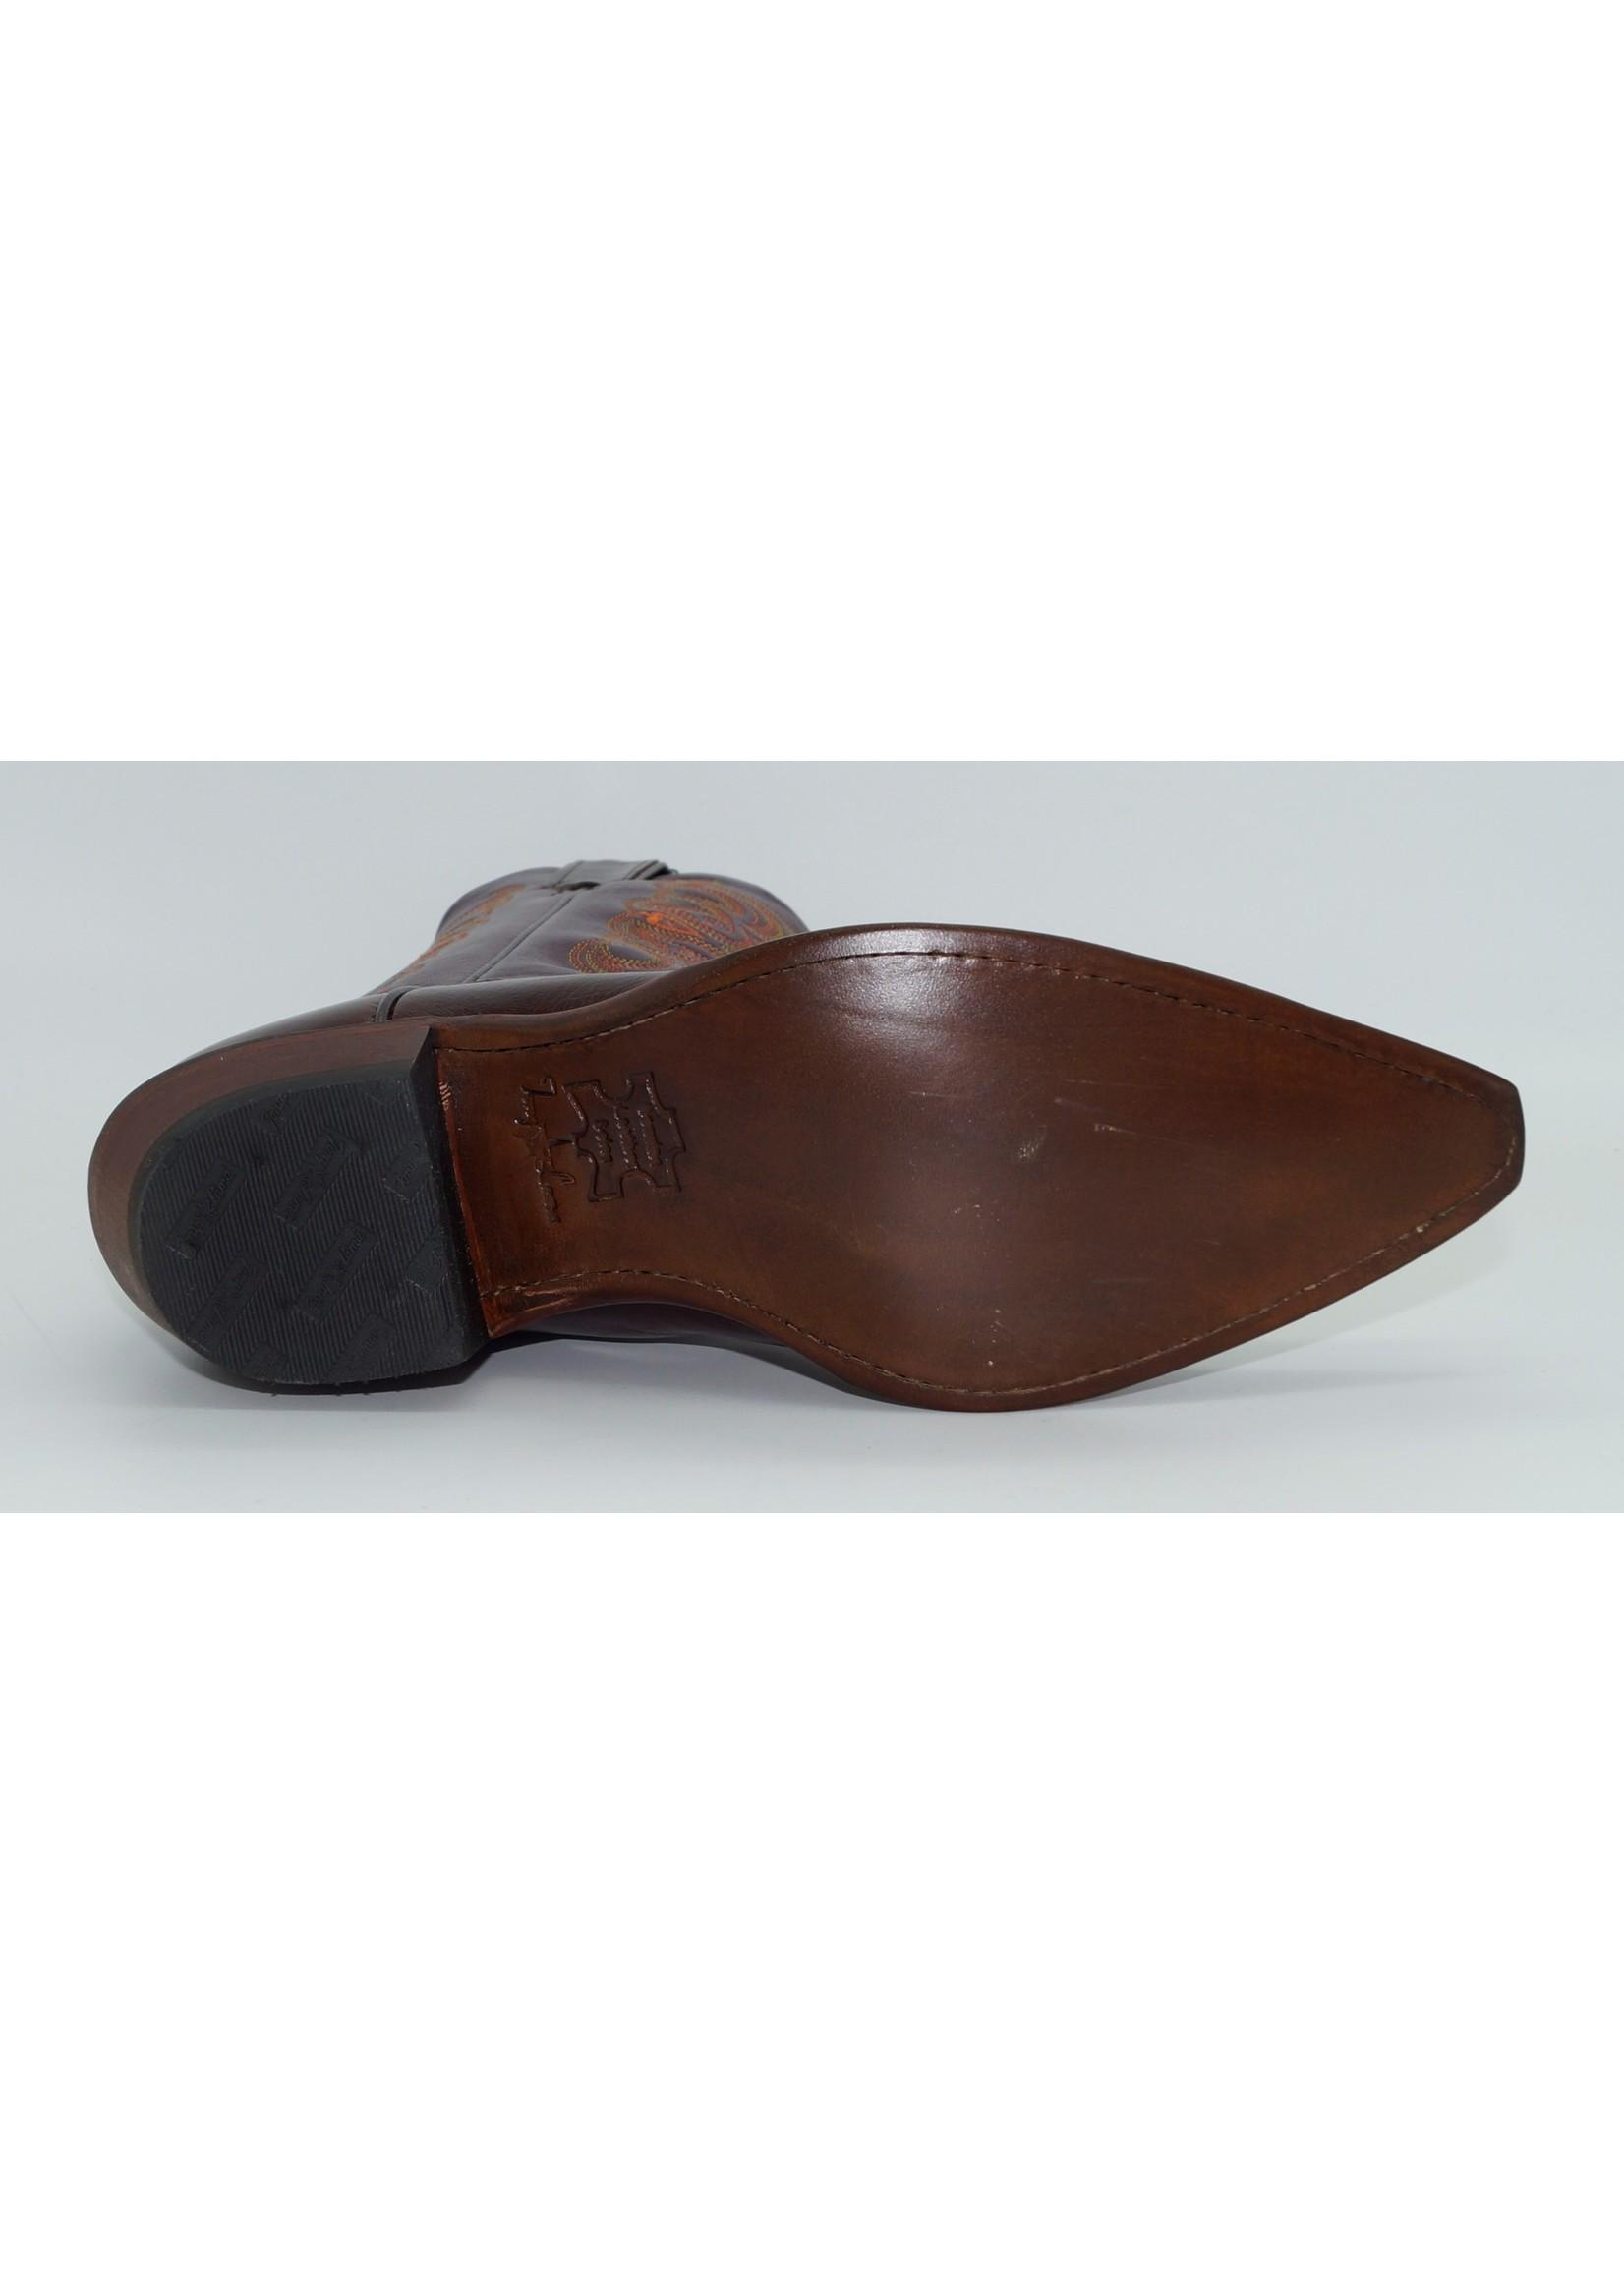 Tony Lama Women's Brown Western Dress Boot VF5828